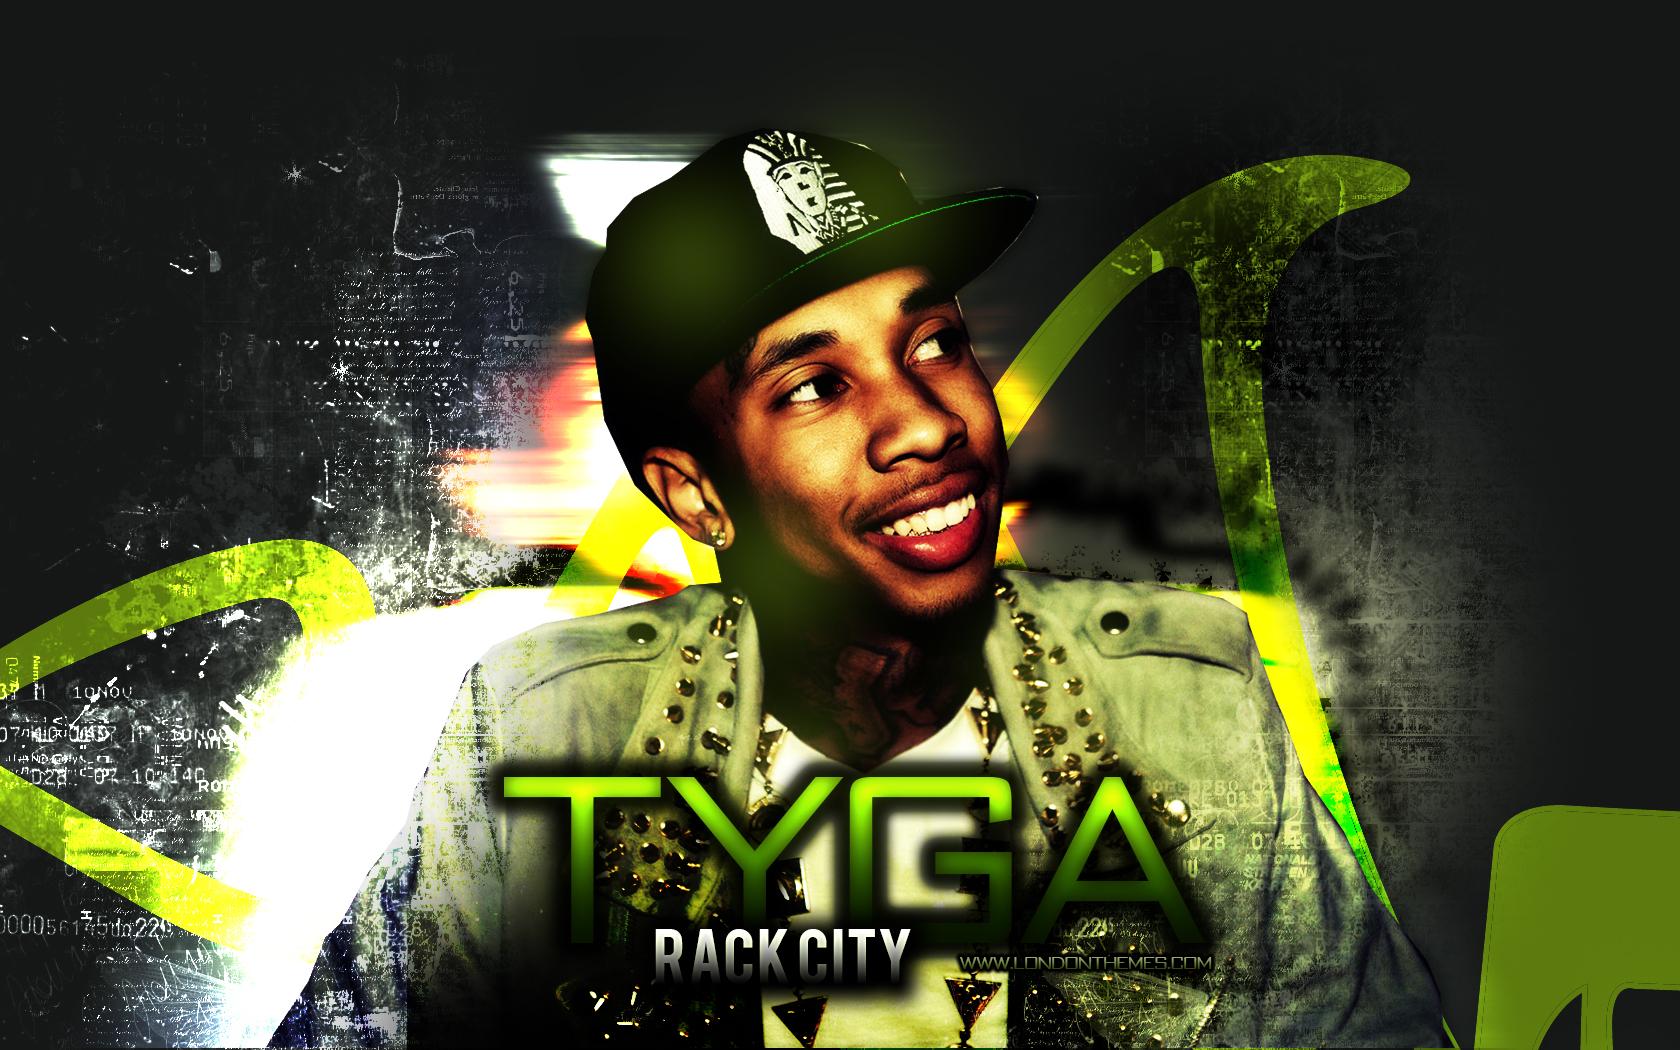 Tyga rack city by lilspeed on deviantart - Tyga wallpaper ...